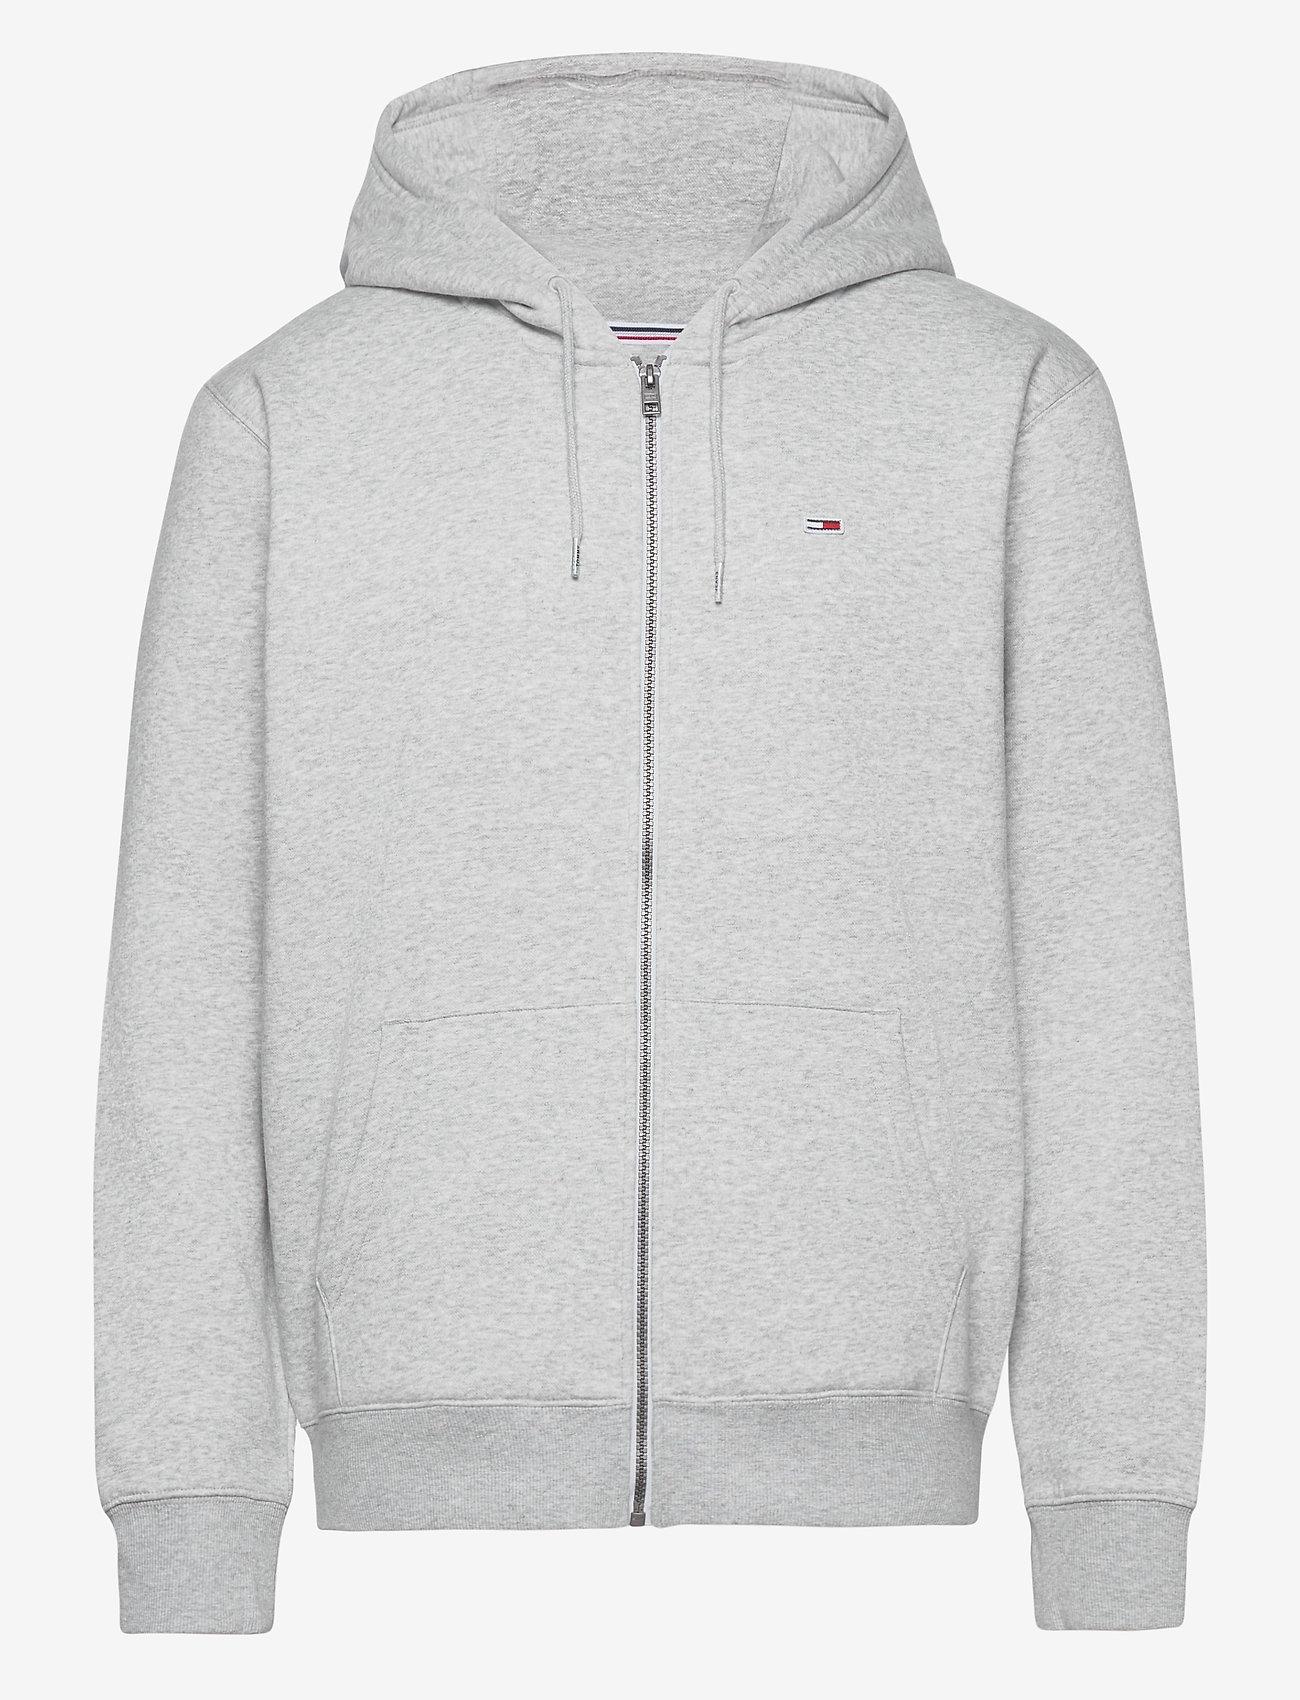 Tommy Jeans - TJM REGULAR FLEECE ZIP HOODIE - hoodies - lt grey htr - 0